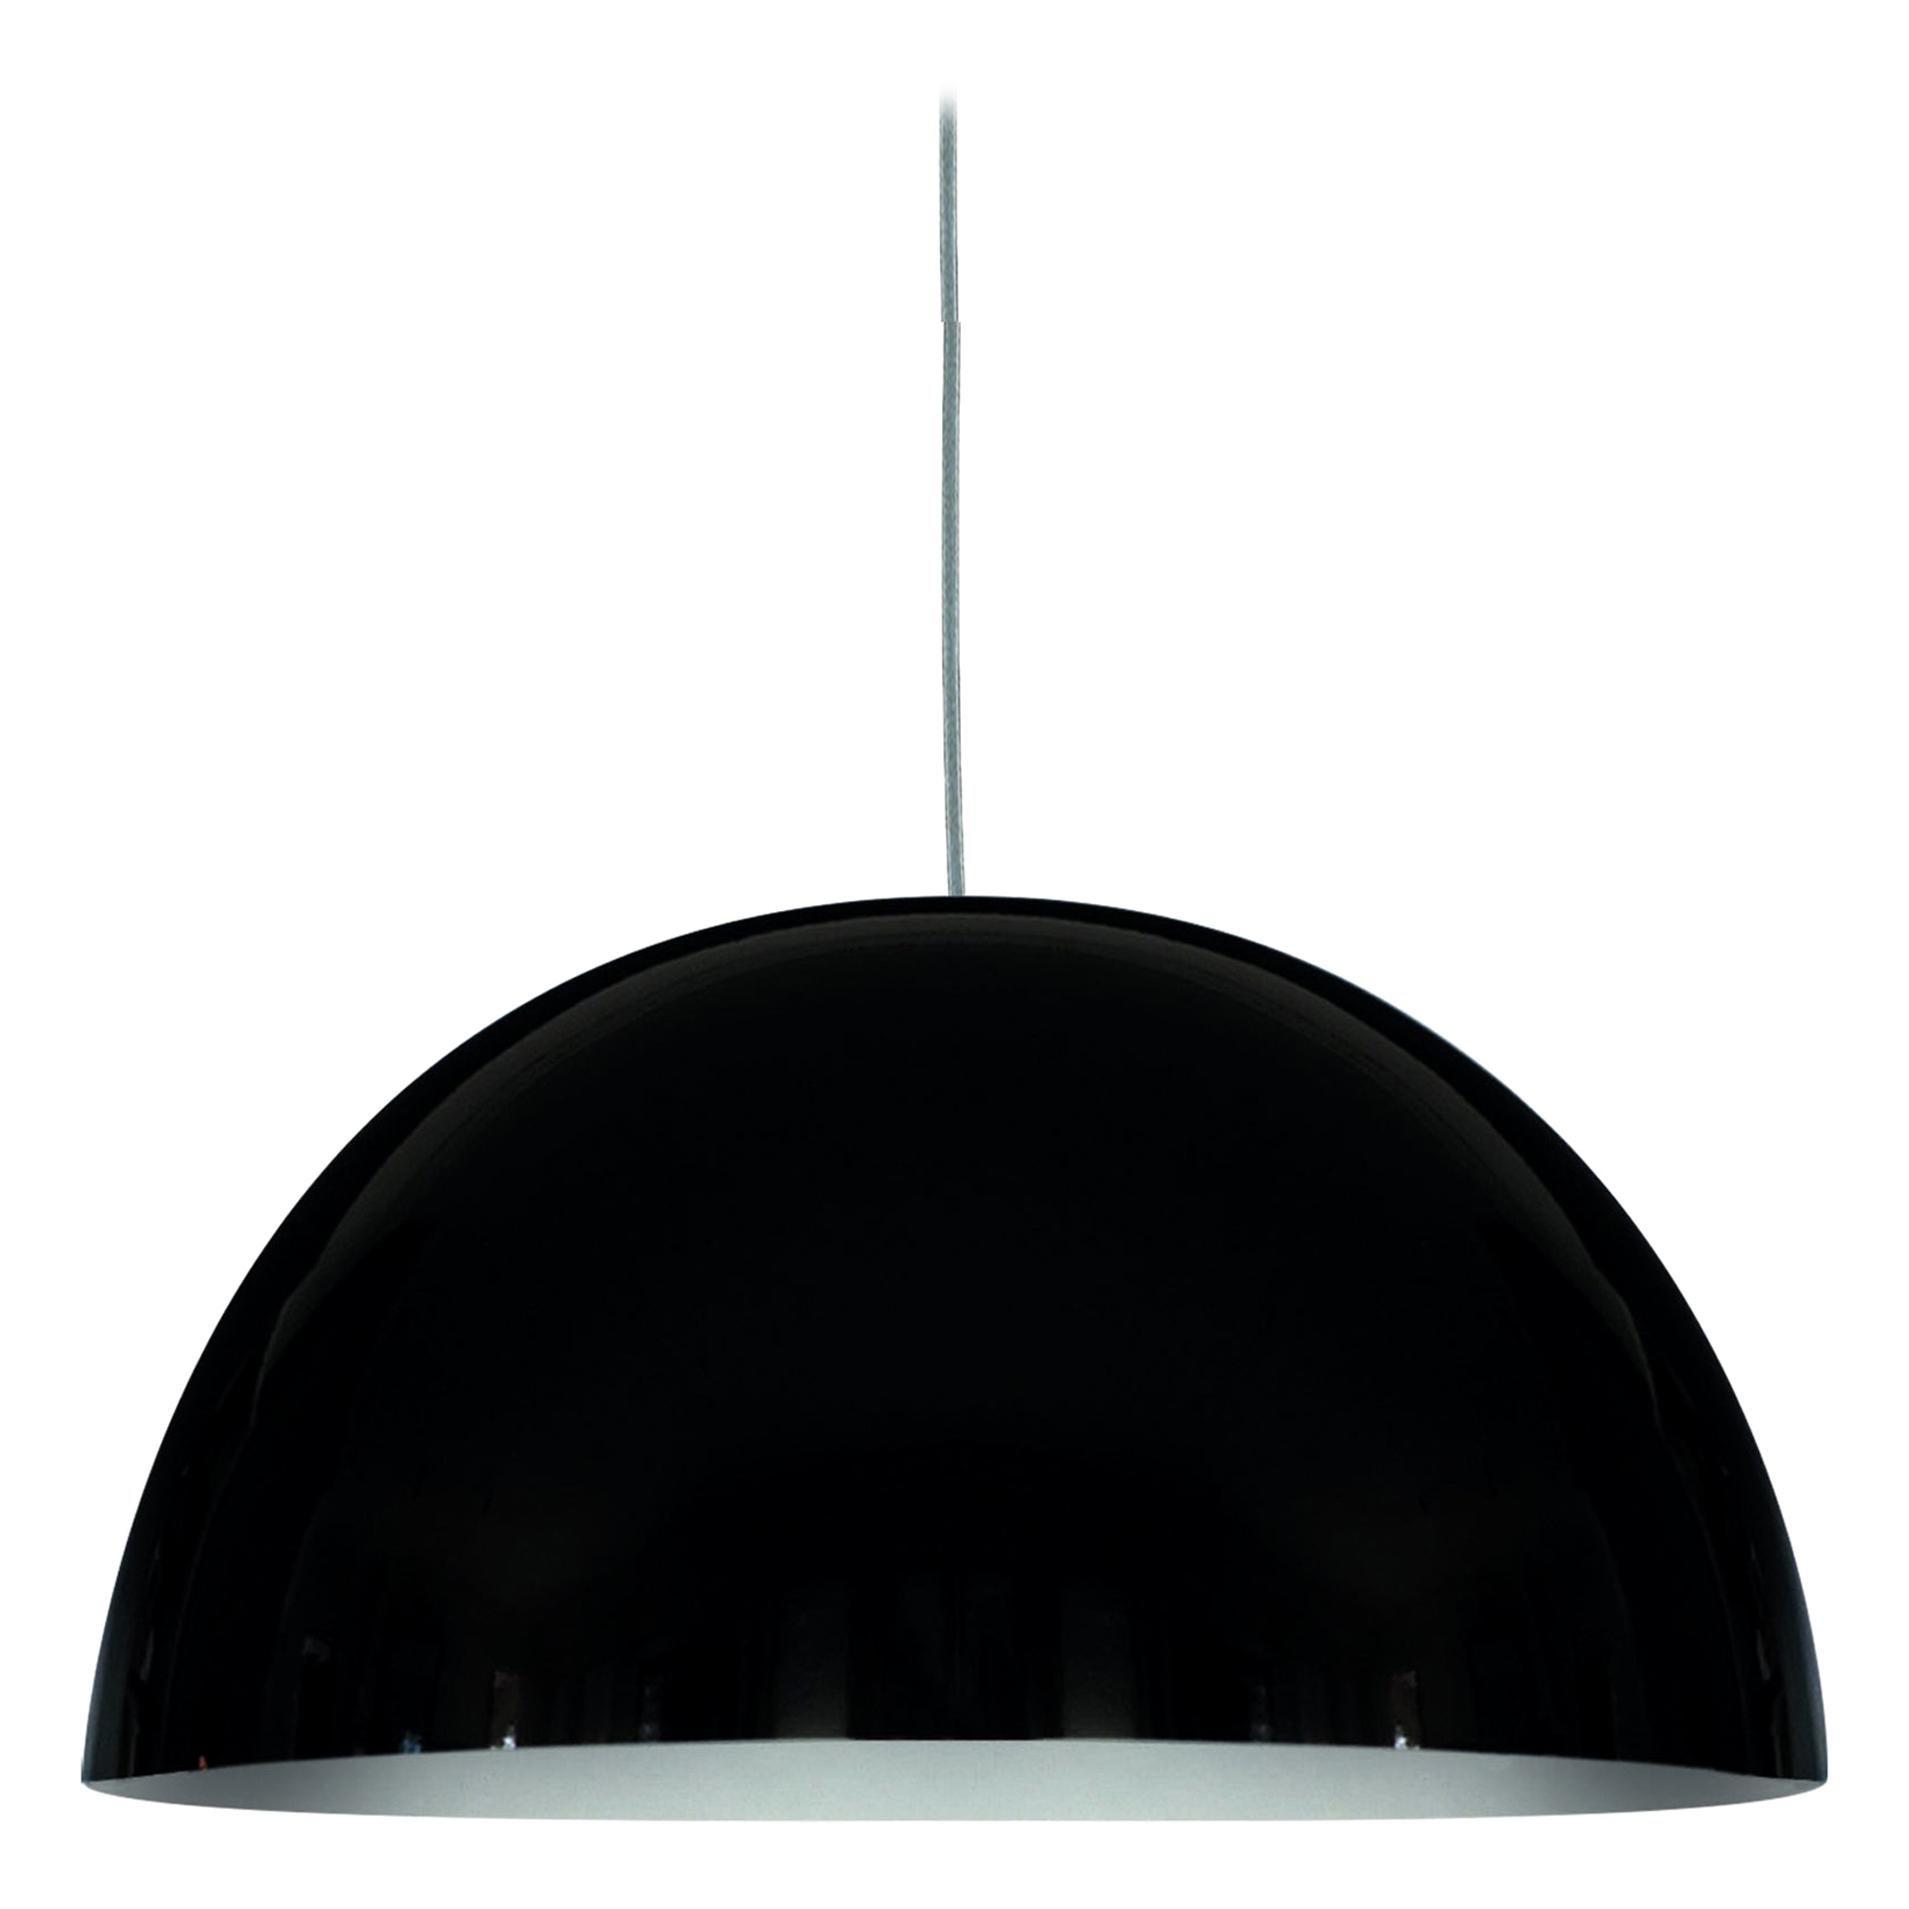 Vico Magistretti Suspension Lamps 'Sonora' Medium Black by Oluce